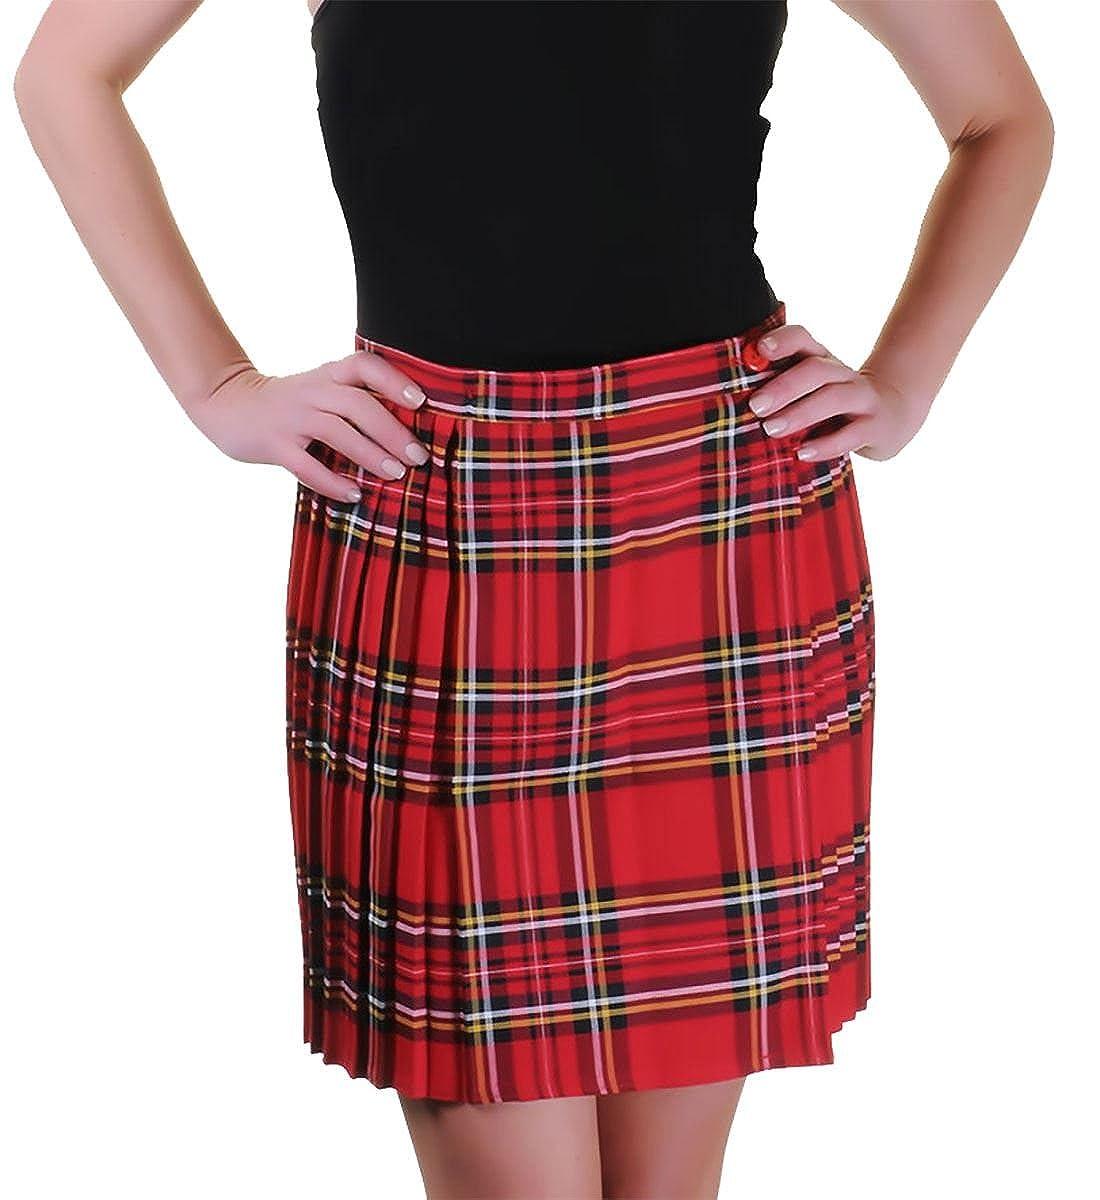 Rimi Hanger Ladies Tartan Pleated Wrap Over Buttoned Kilt Skirt US 4-20